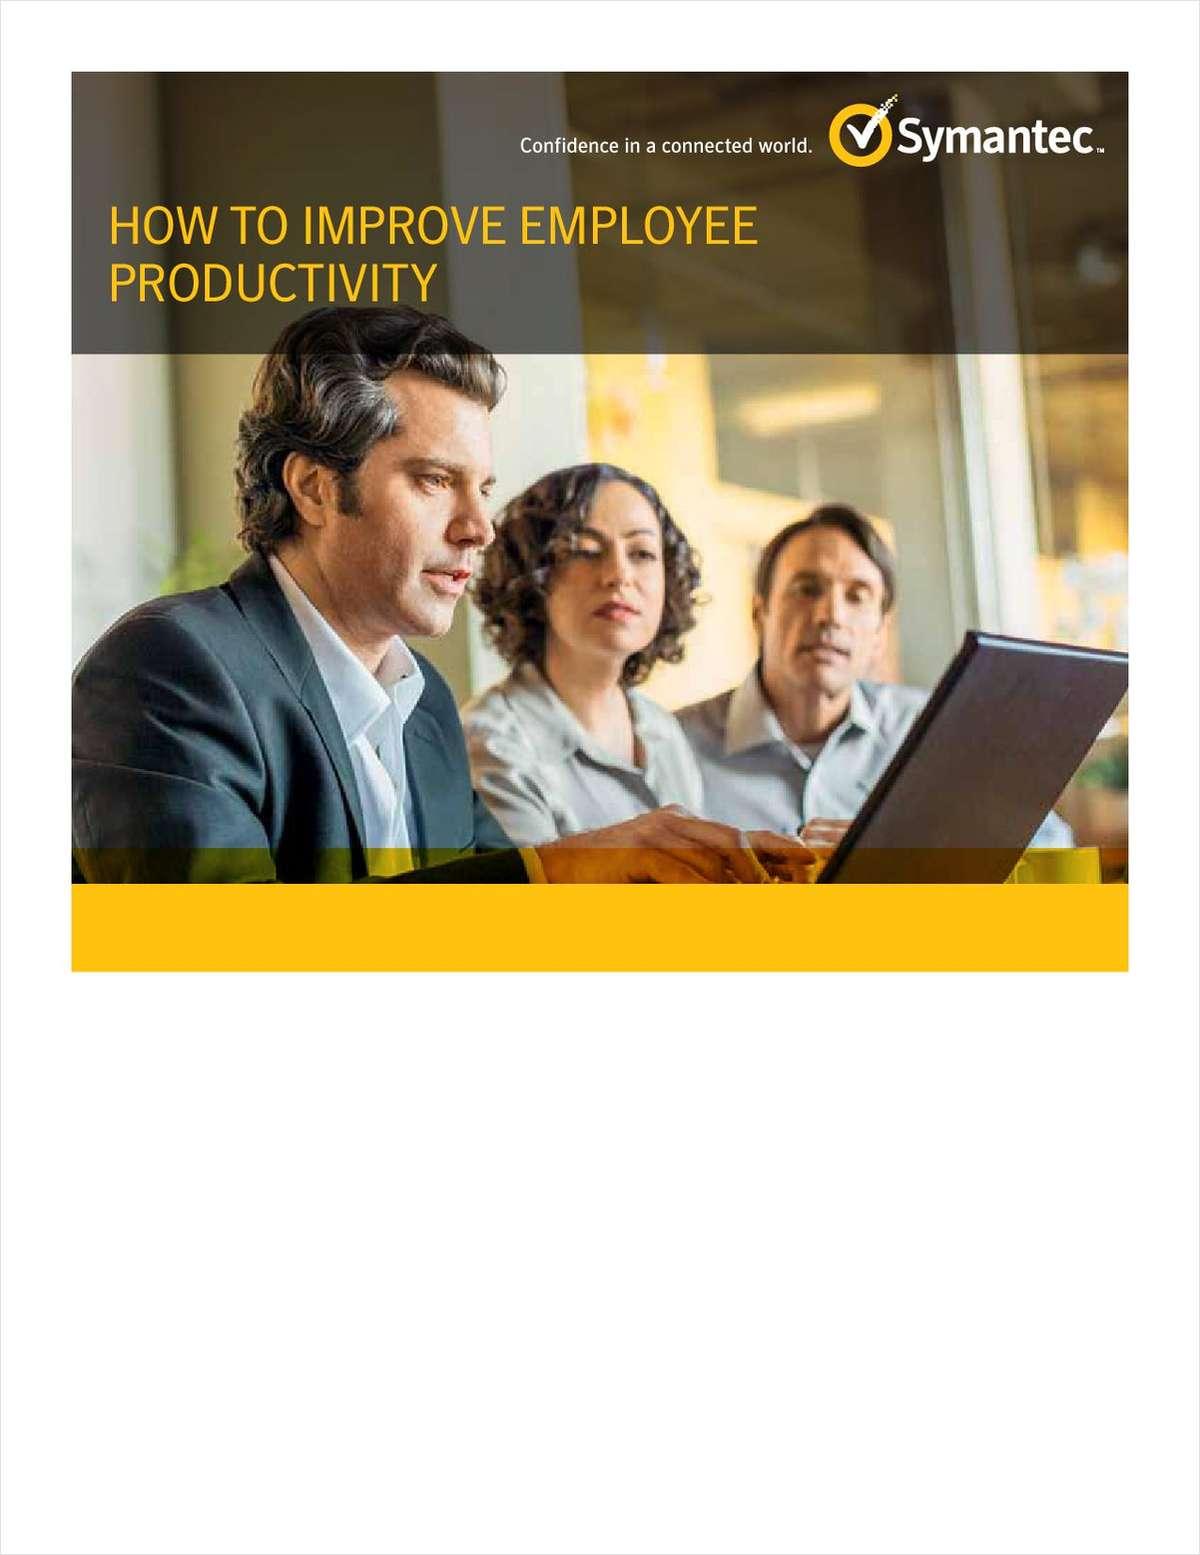 How to Improve Employee Productivity